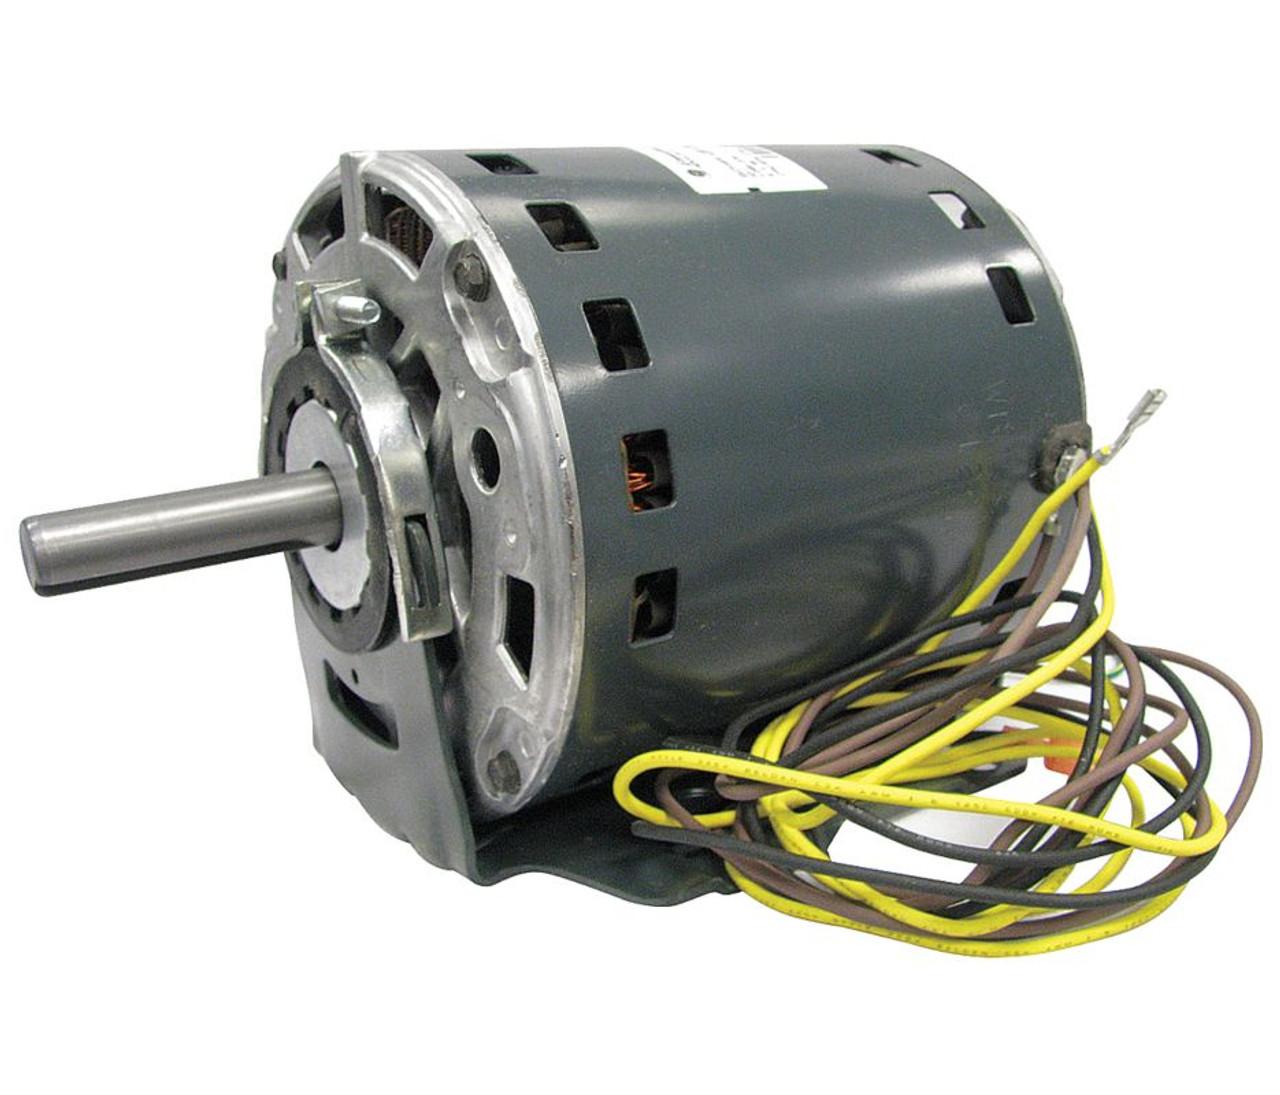 Carrier Blower Motor 5kcp39pgwb13s 1 Hp  1650 Rpm  460v Genteq   3s054